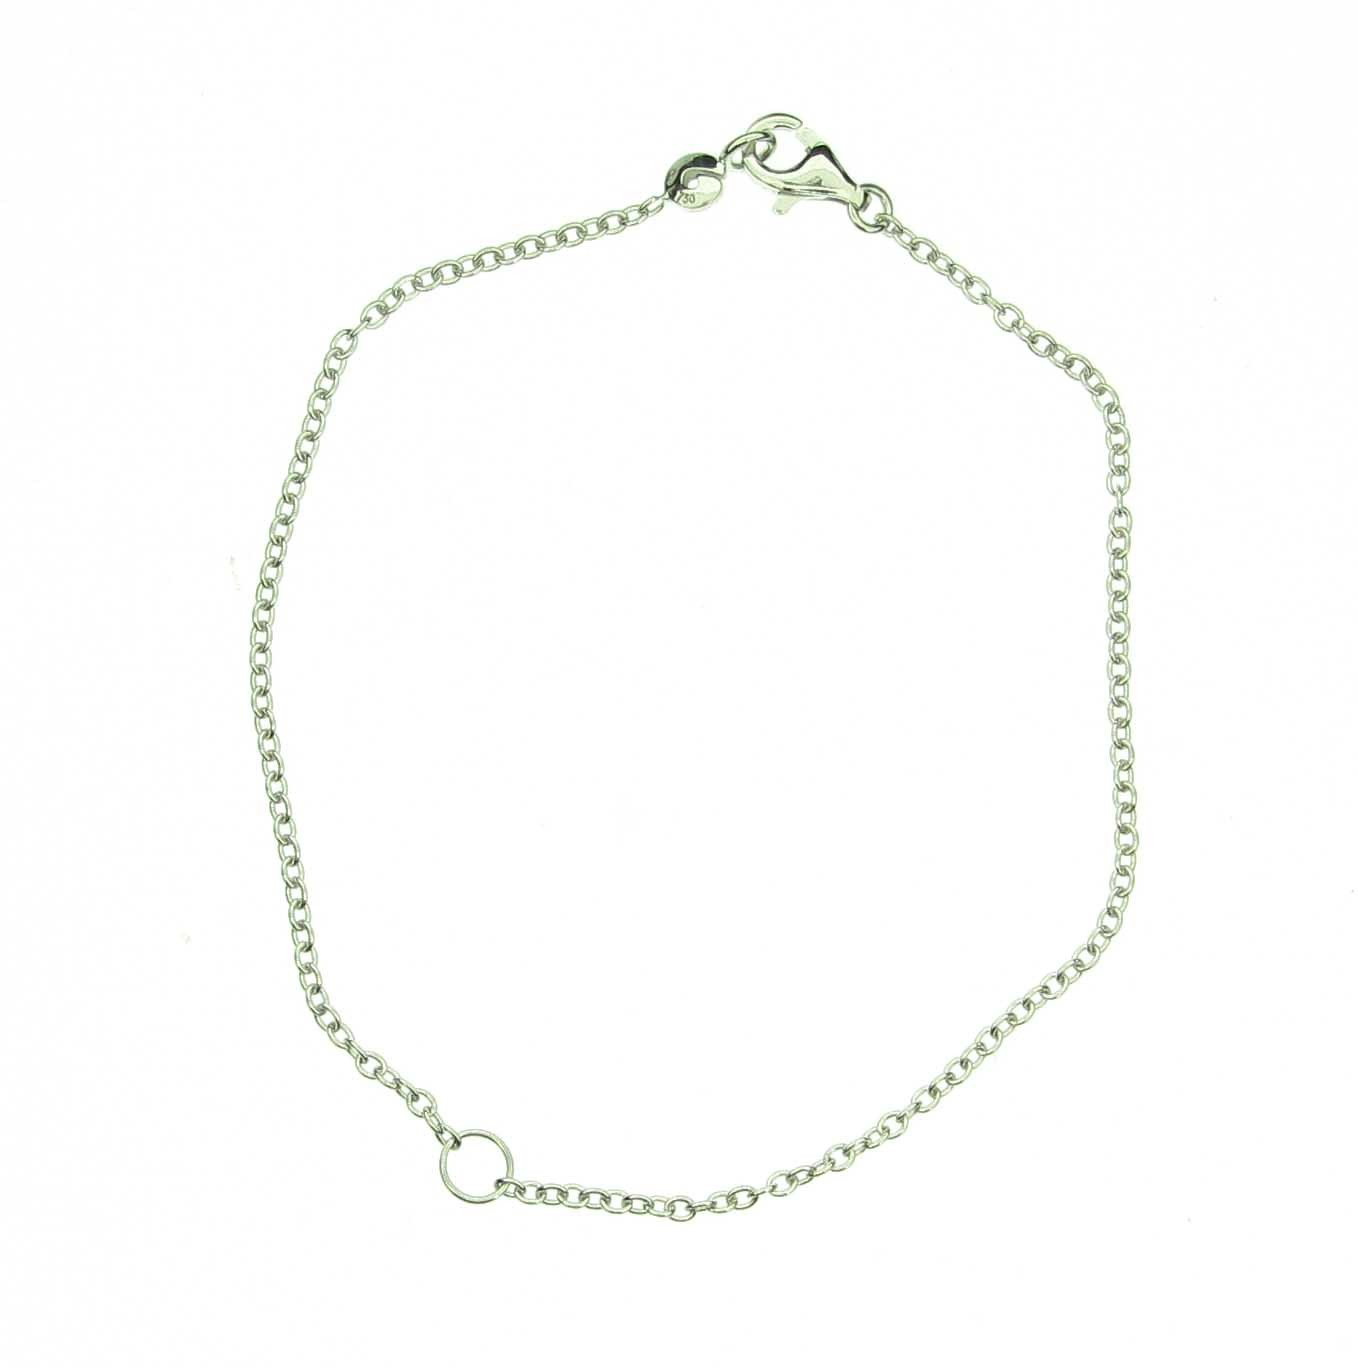 Armband 18ct Weißgold - Ole Lynggaard - C2018-501